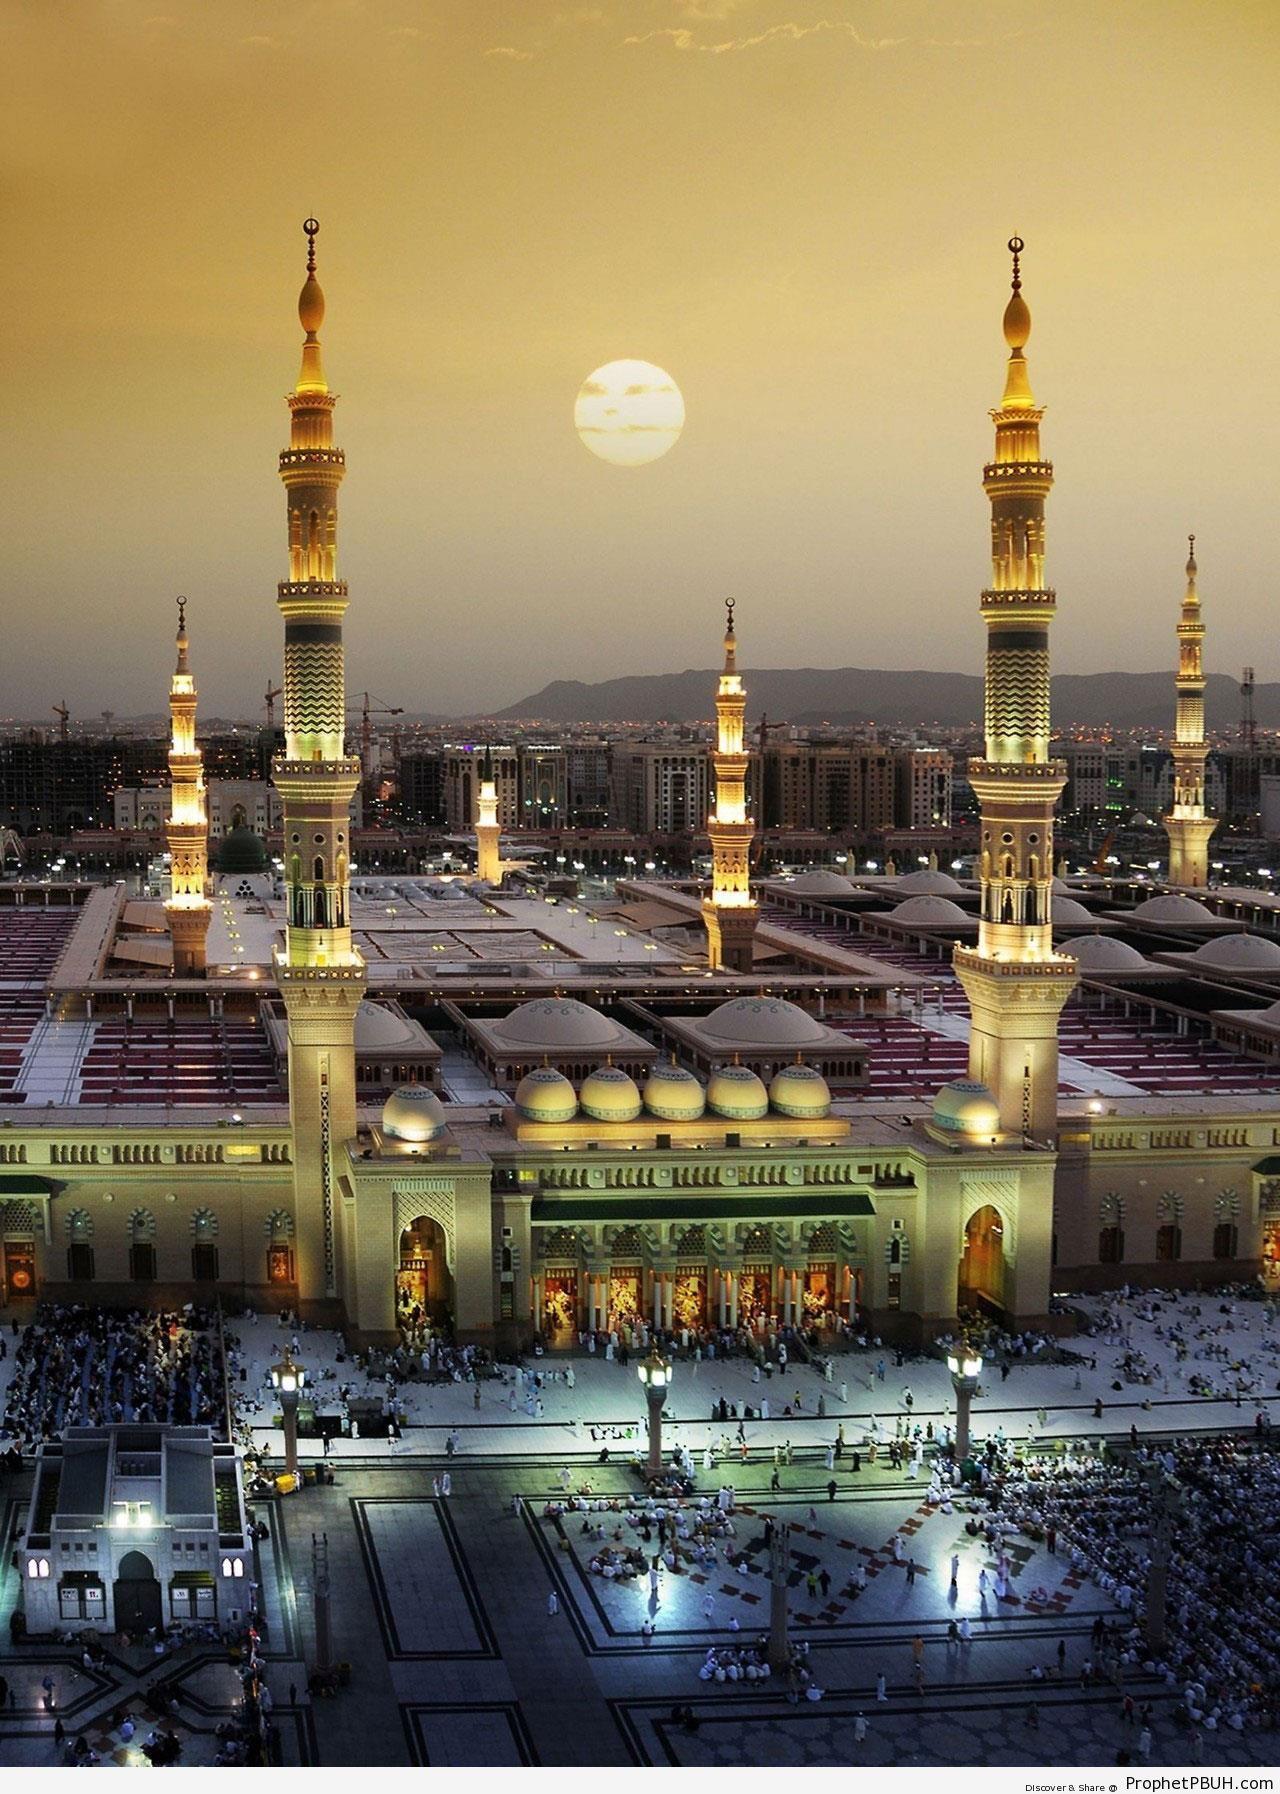 The Prophet-s Mosque in al-Madinah, Saudi Arabia - Al-Masjid an-Nabawi (The Prophets Mosque) in Madinah, Saudi Arabia -Picture